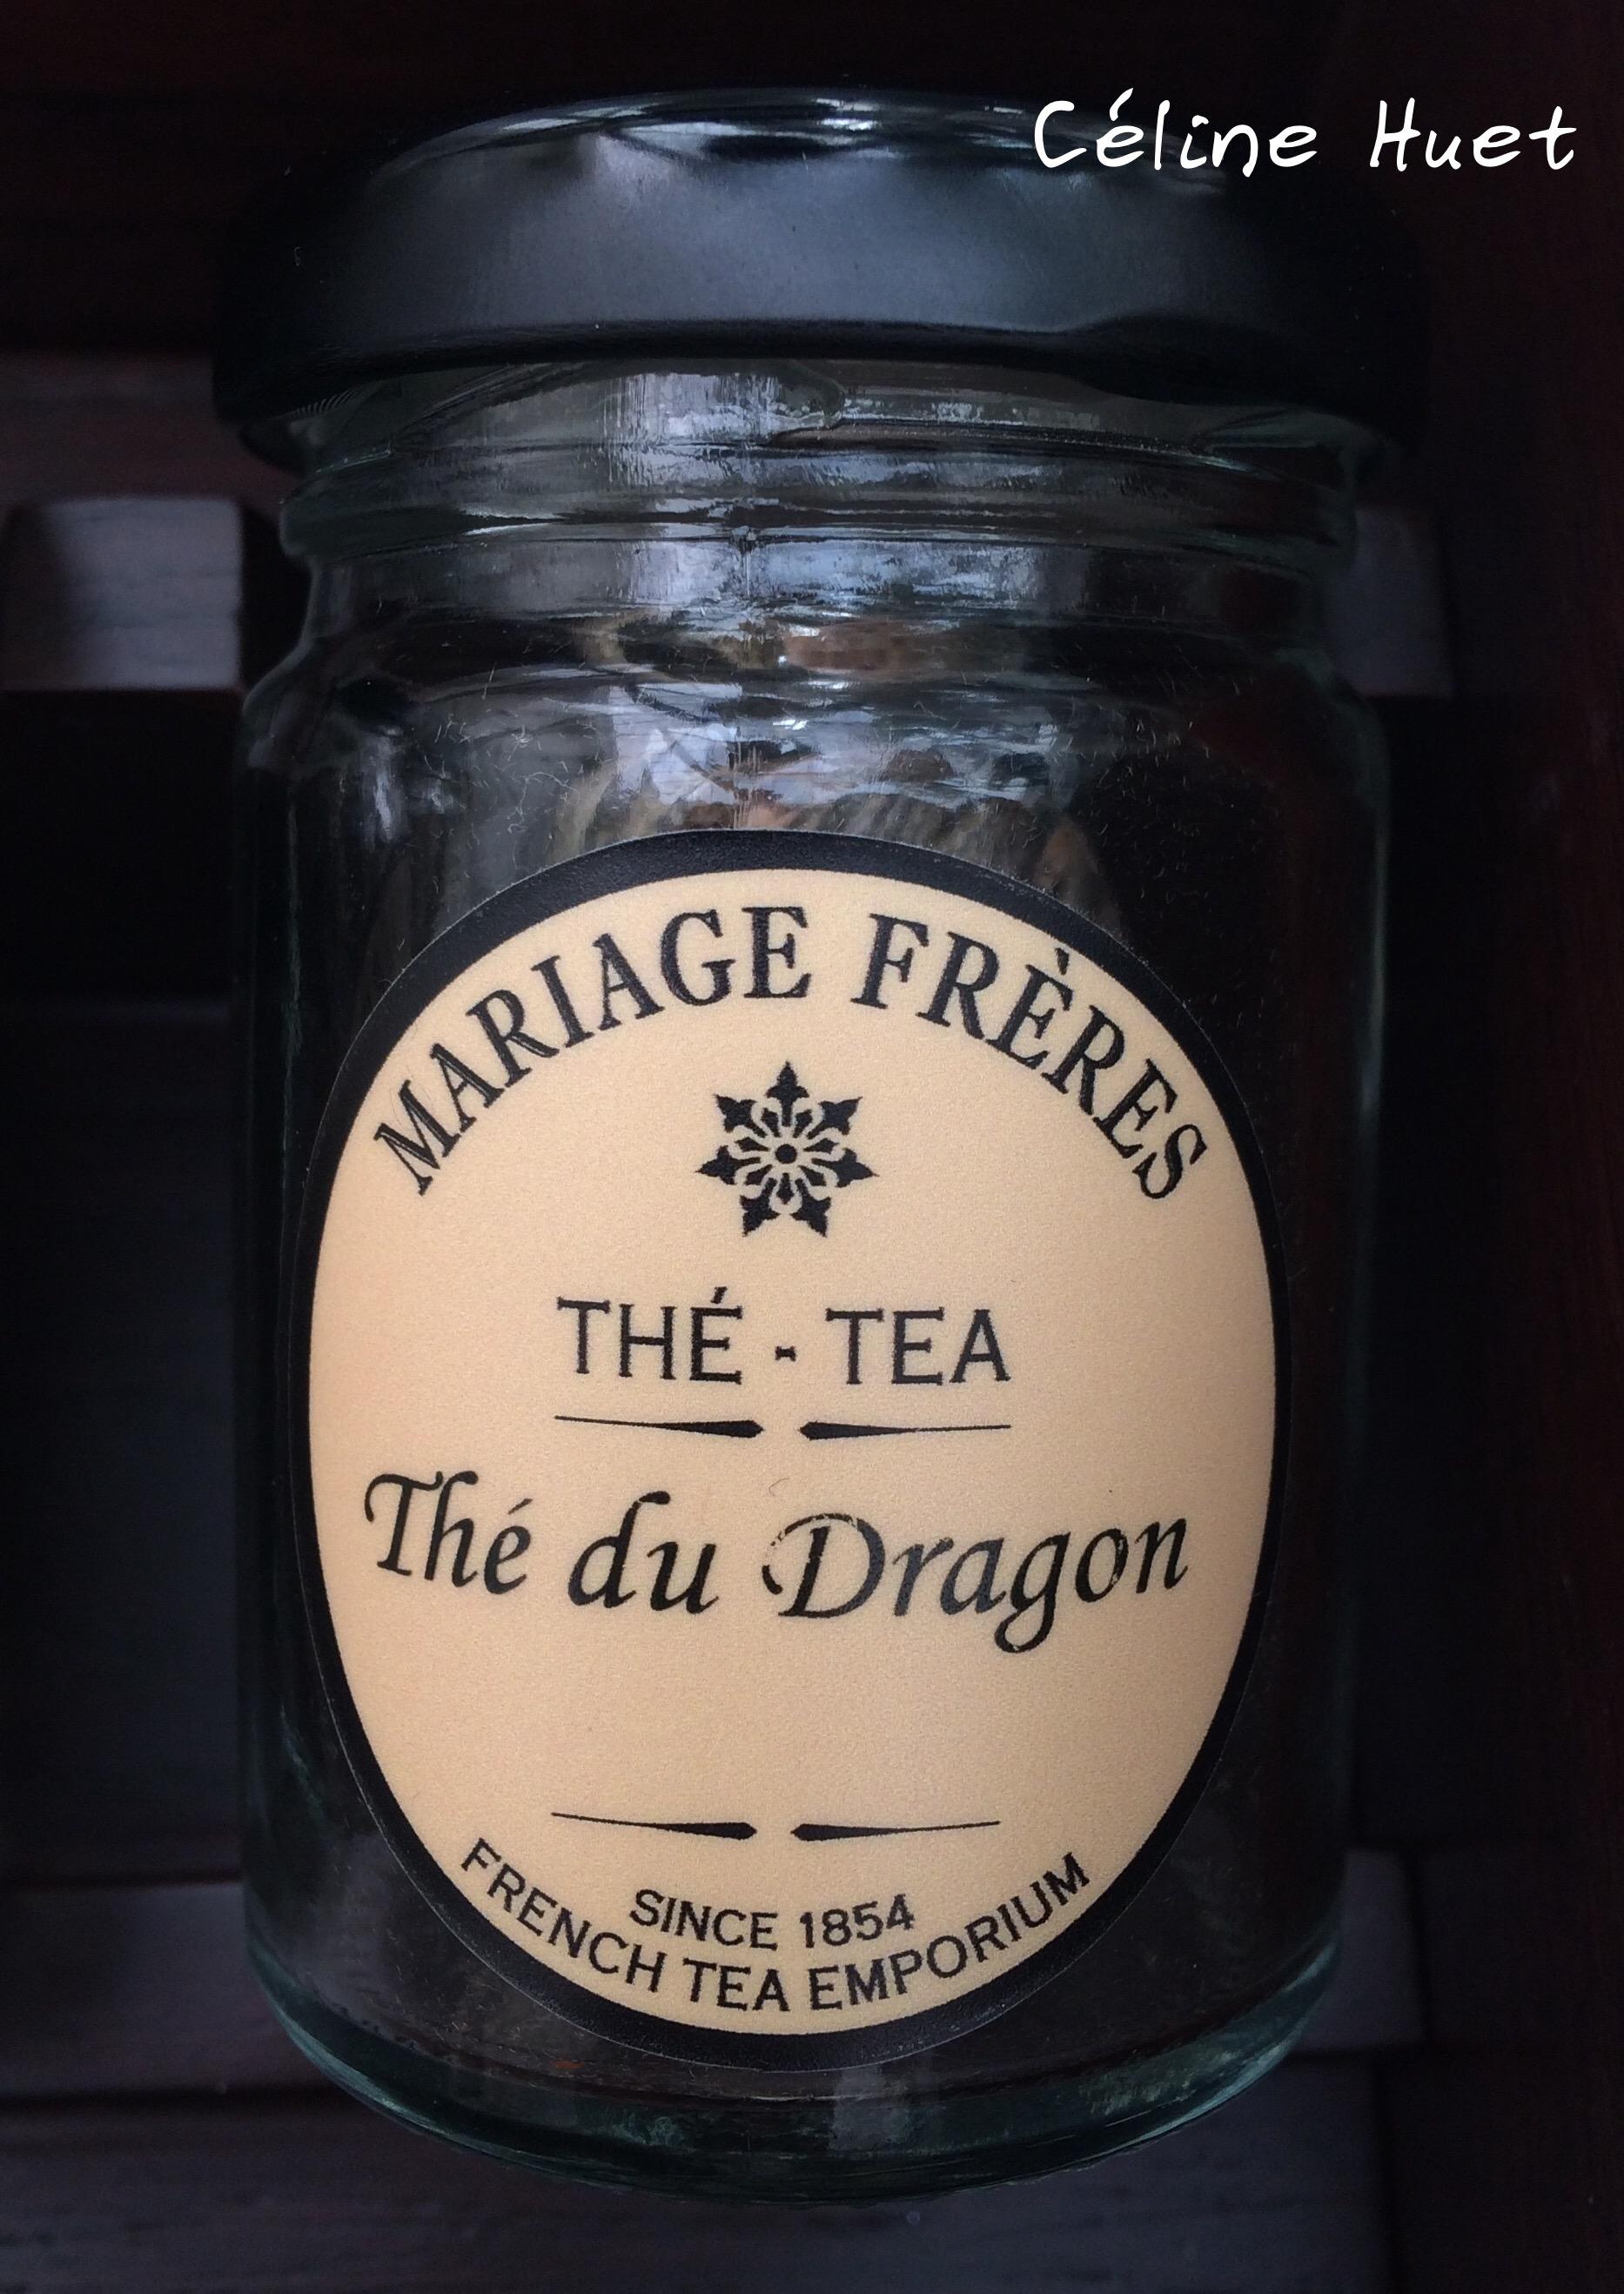 Thé du dragon Mariage Frères Mandarin Oriental Bangkok Thaïlande Asie